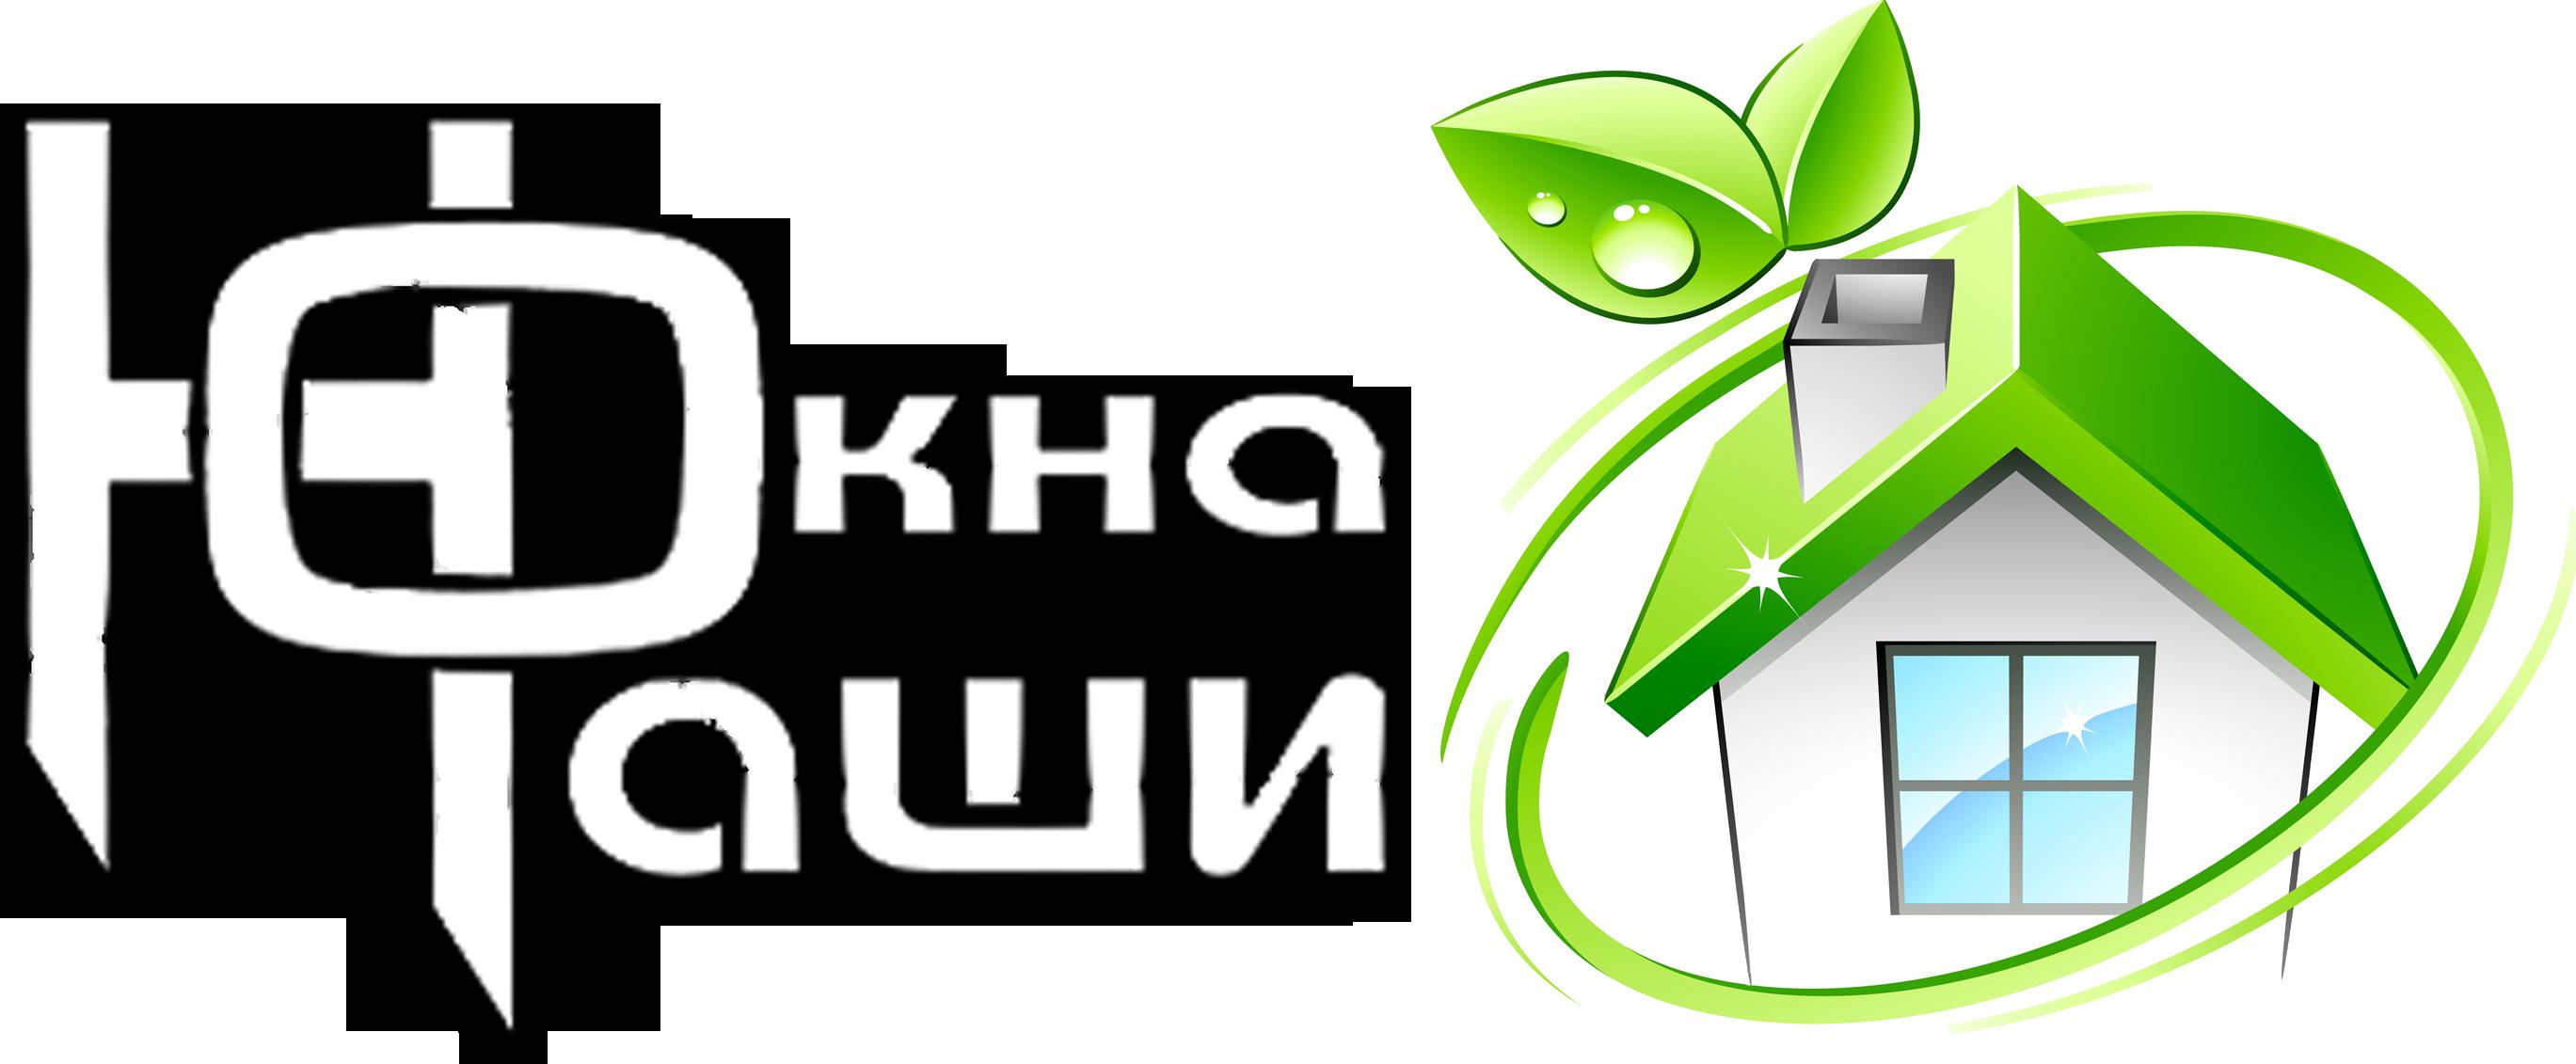 Наши окна Павлоград | Окна WDS Павлоград | Консультация, замер, продажа, установка, обслуживание